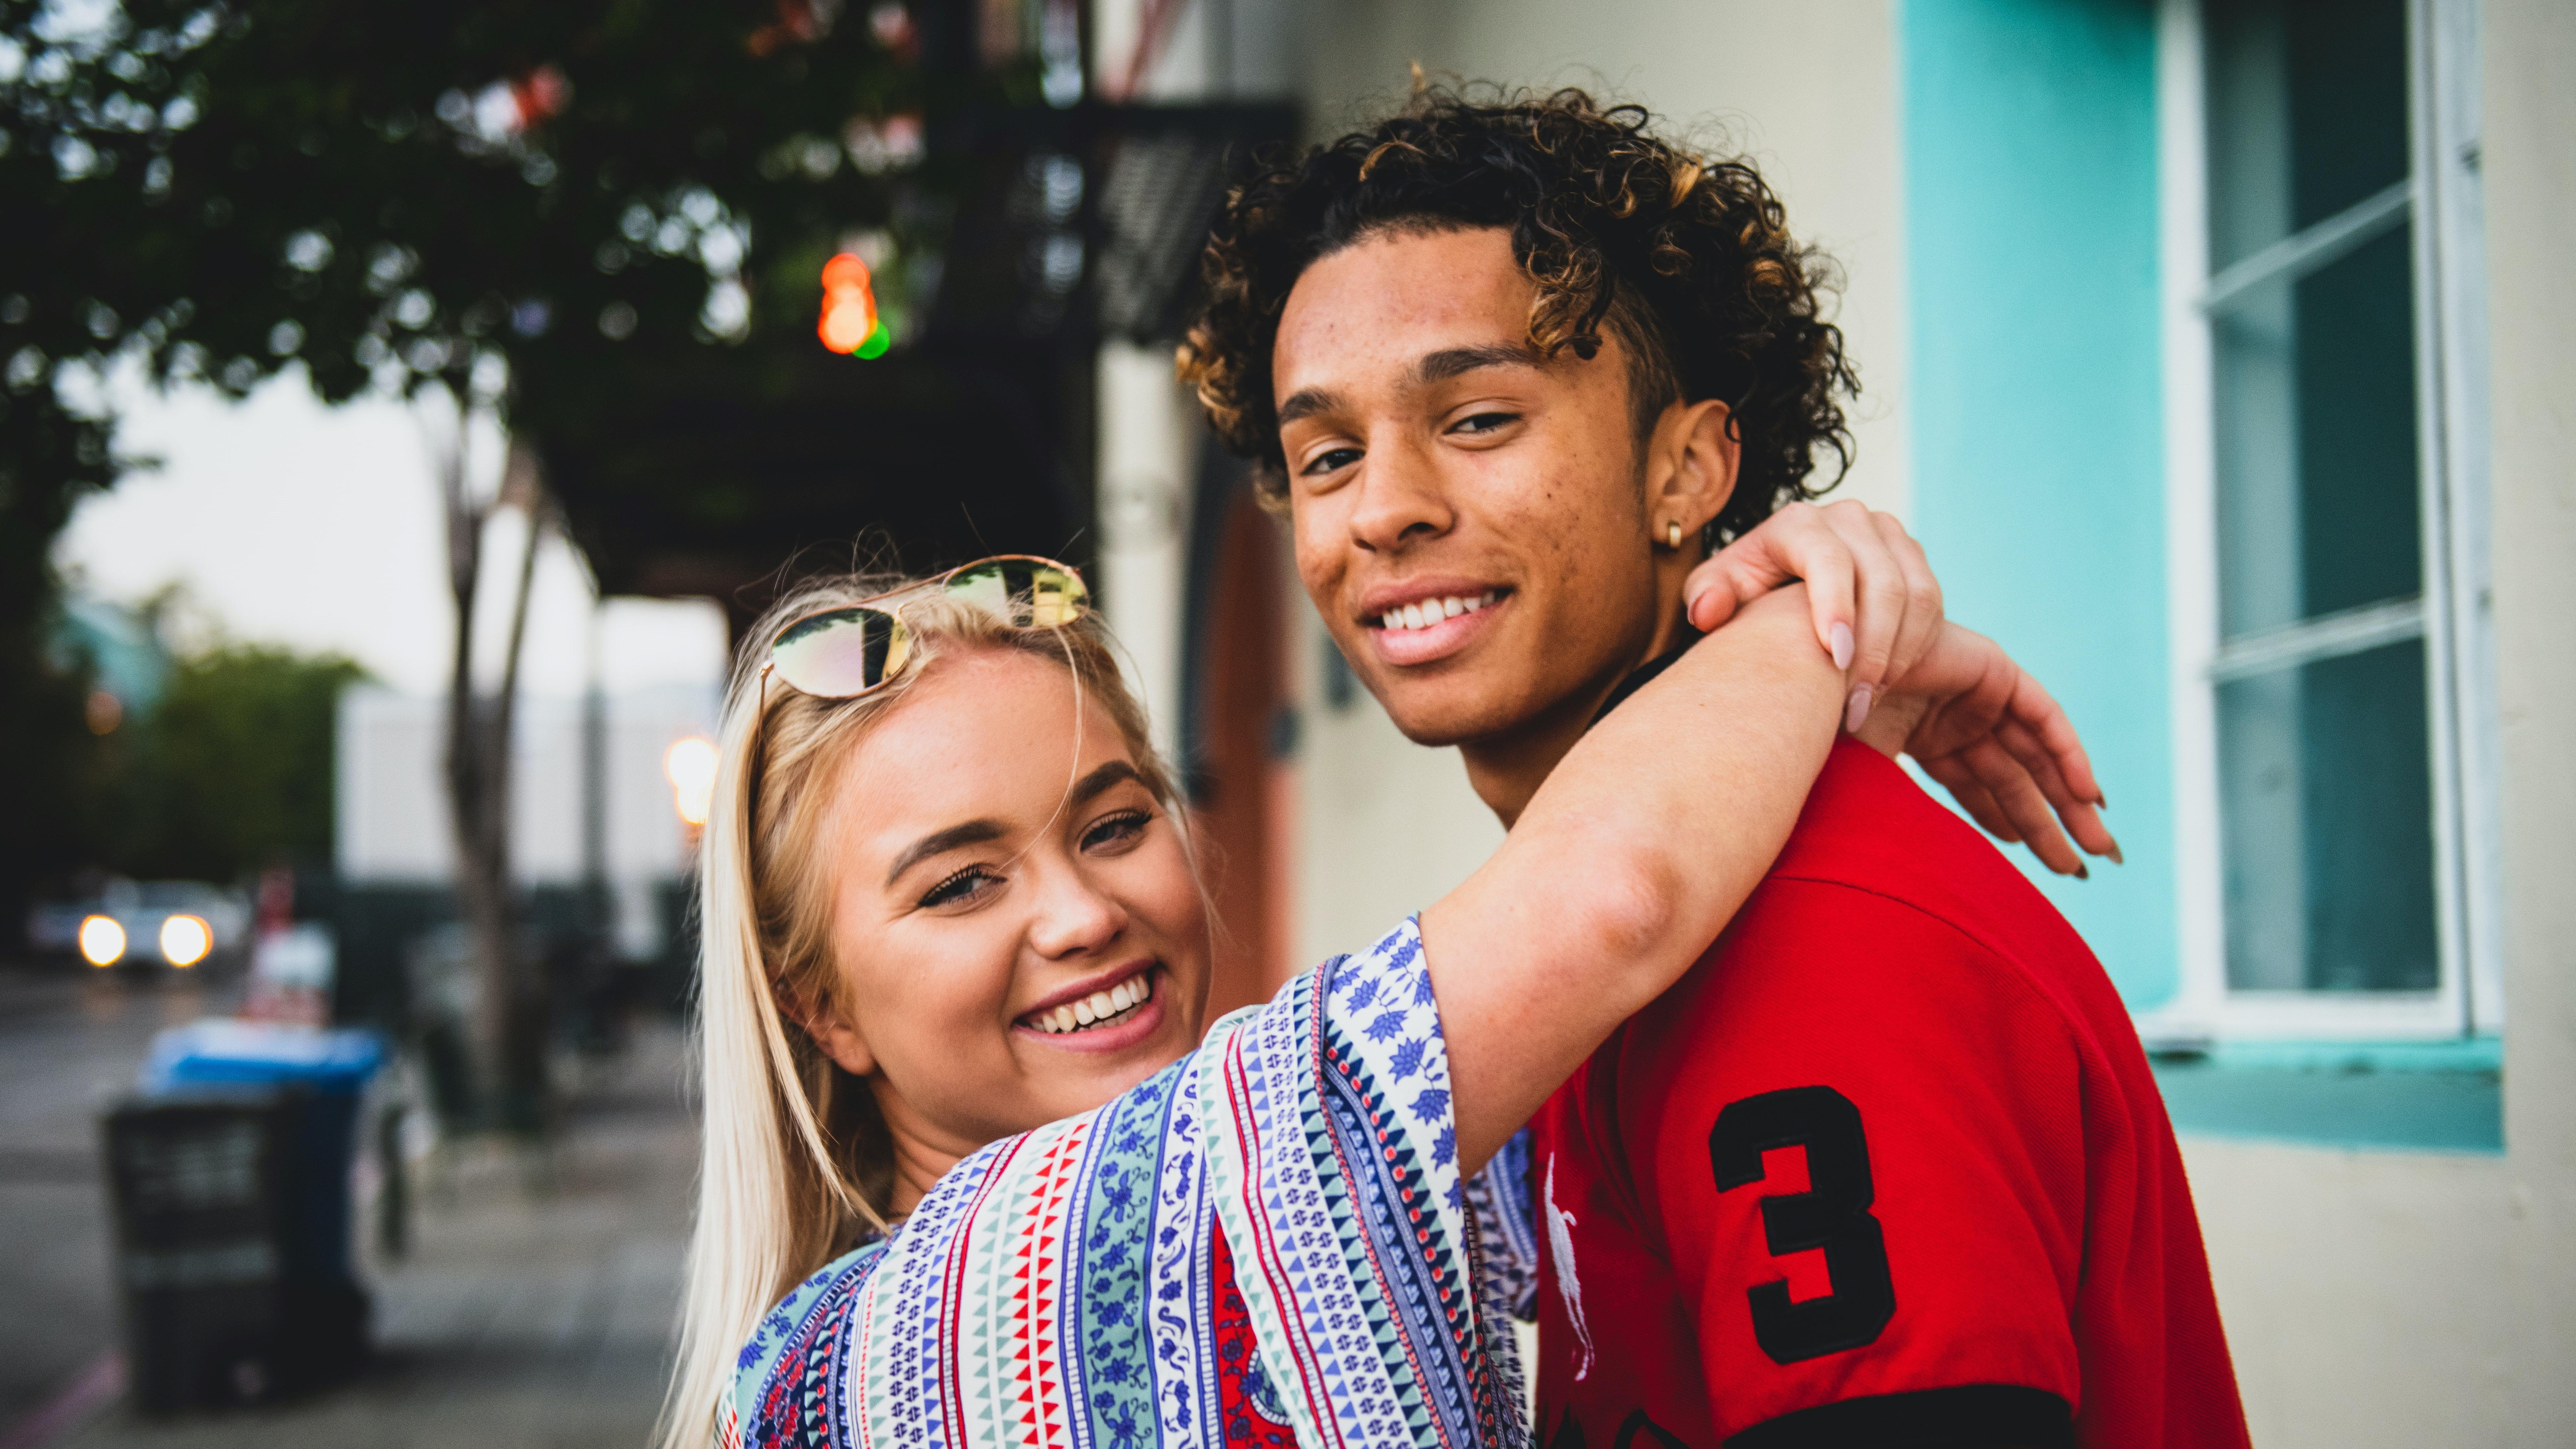 Interkulturelle Beziehungen: So gelingen Partnerschaften